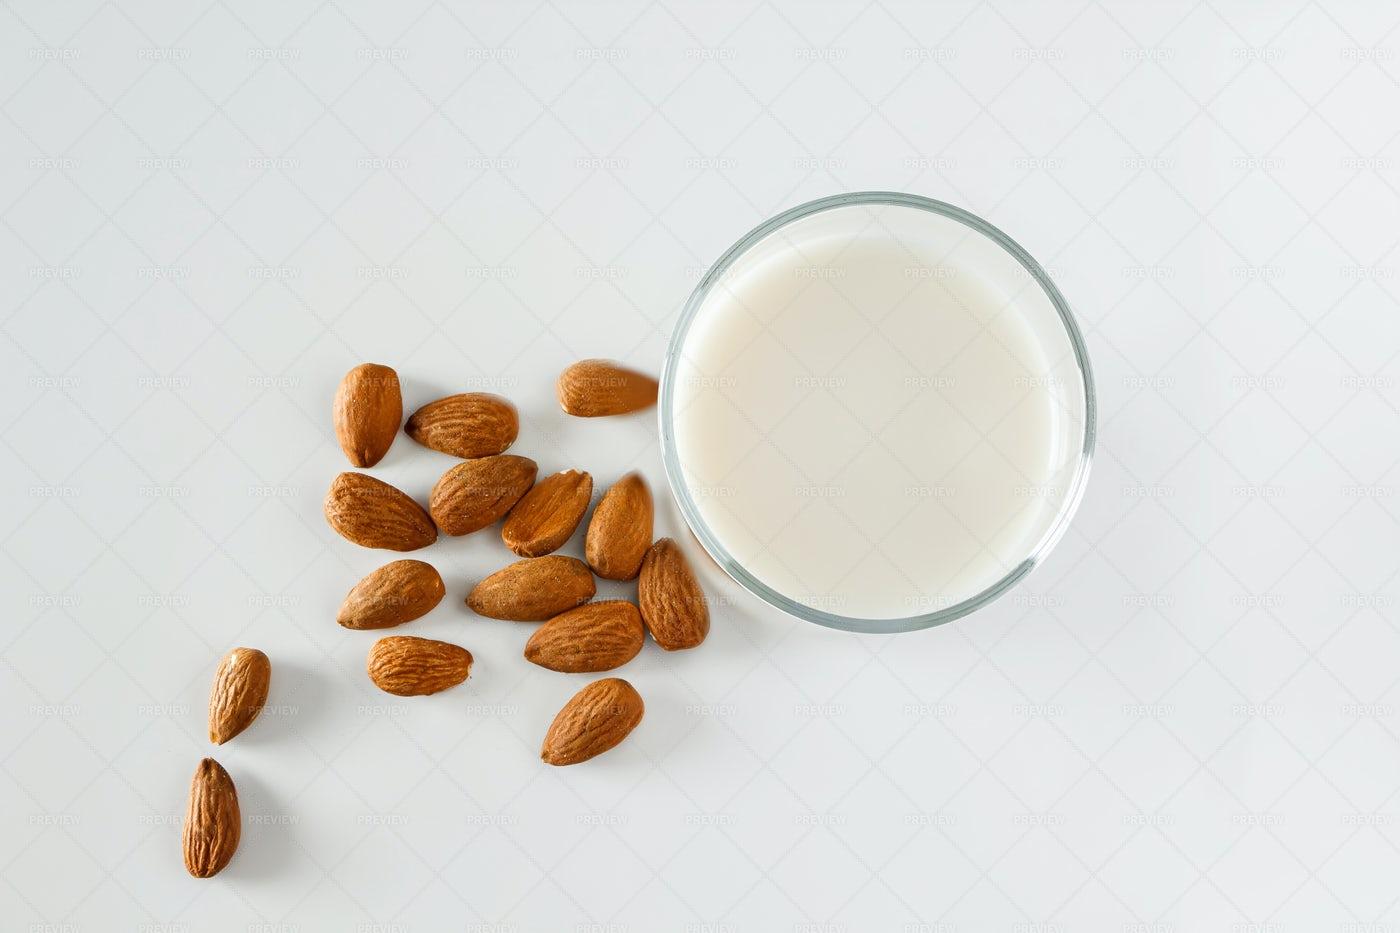 Glass Of Almond Milk: Stock Photos